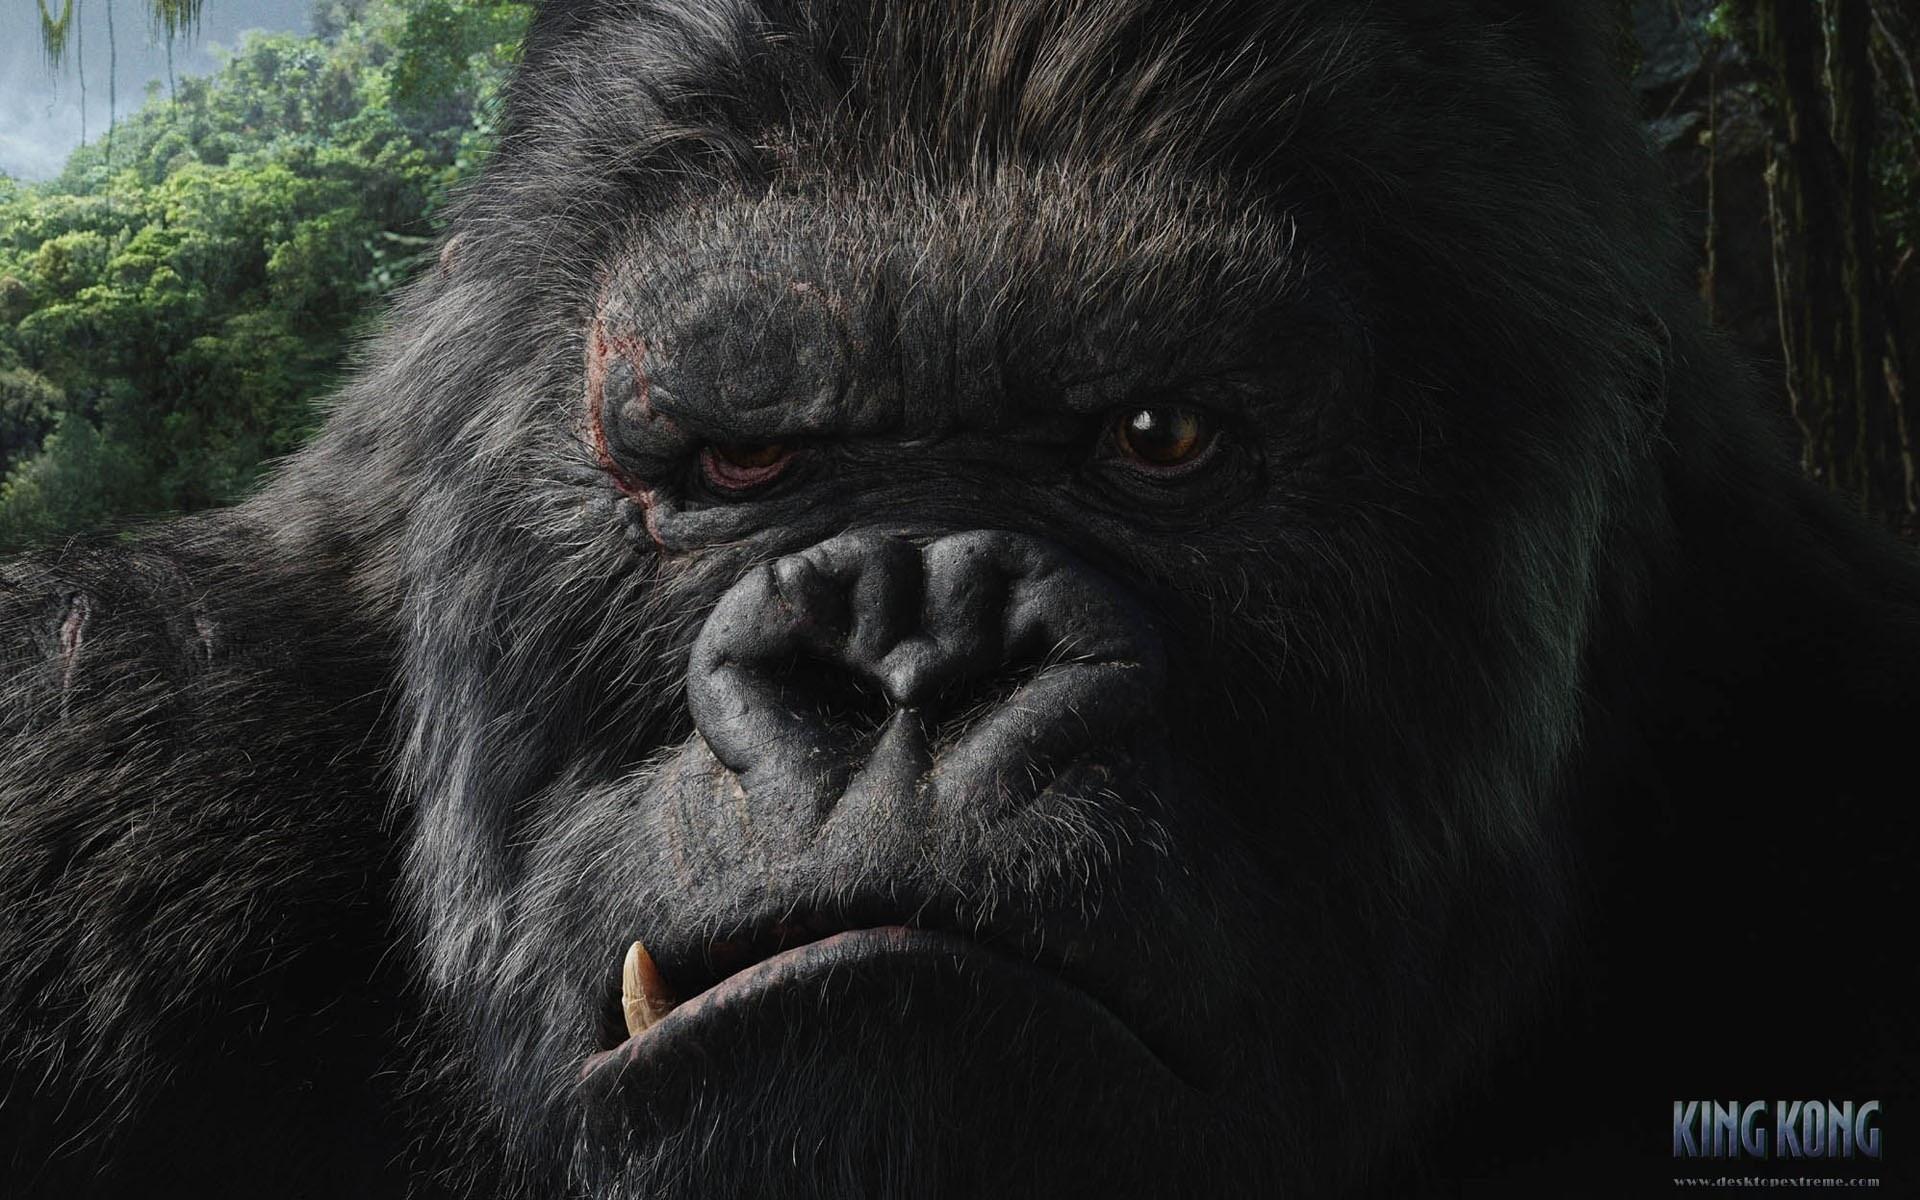 King Kong (2005) wallpapers HD quality